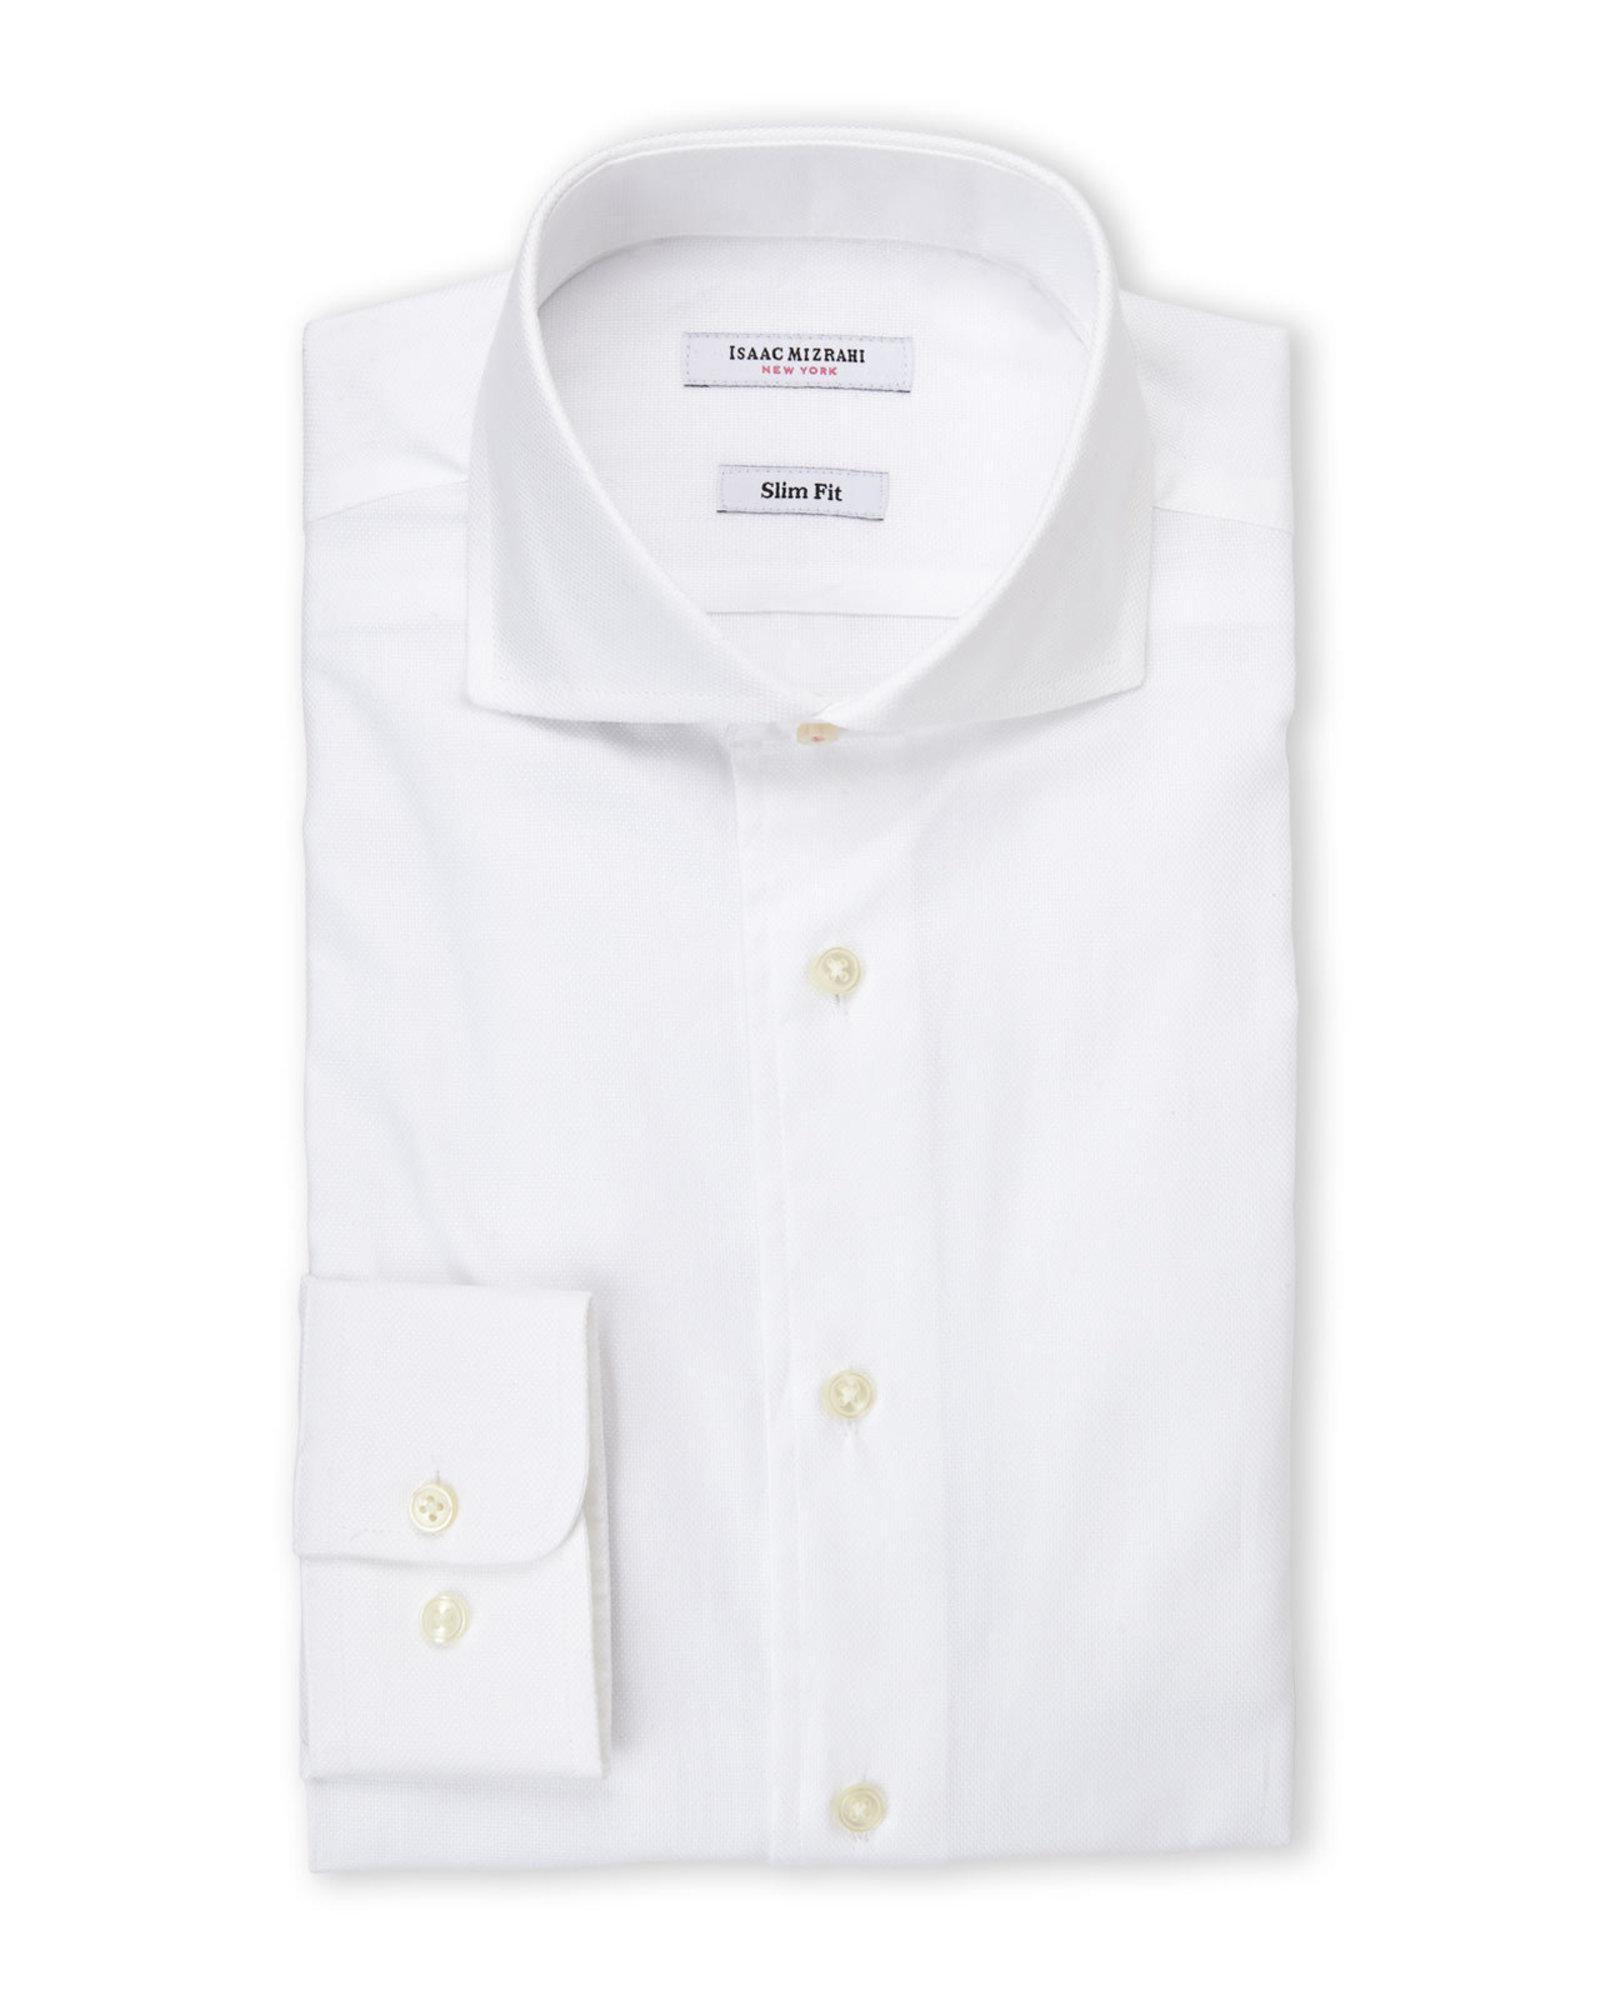 Isaac mizrahi new york slim fit white oxford dress shirt for Century 21 dress shirts